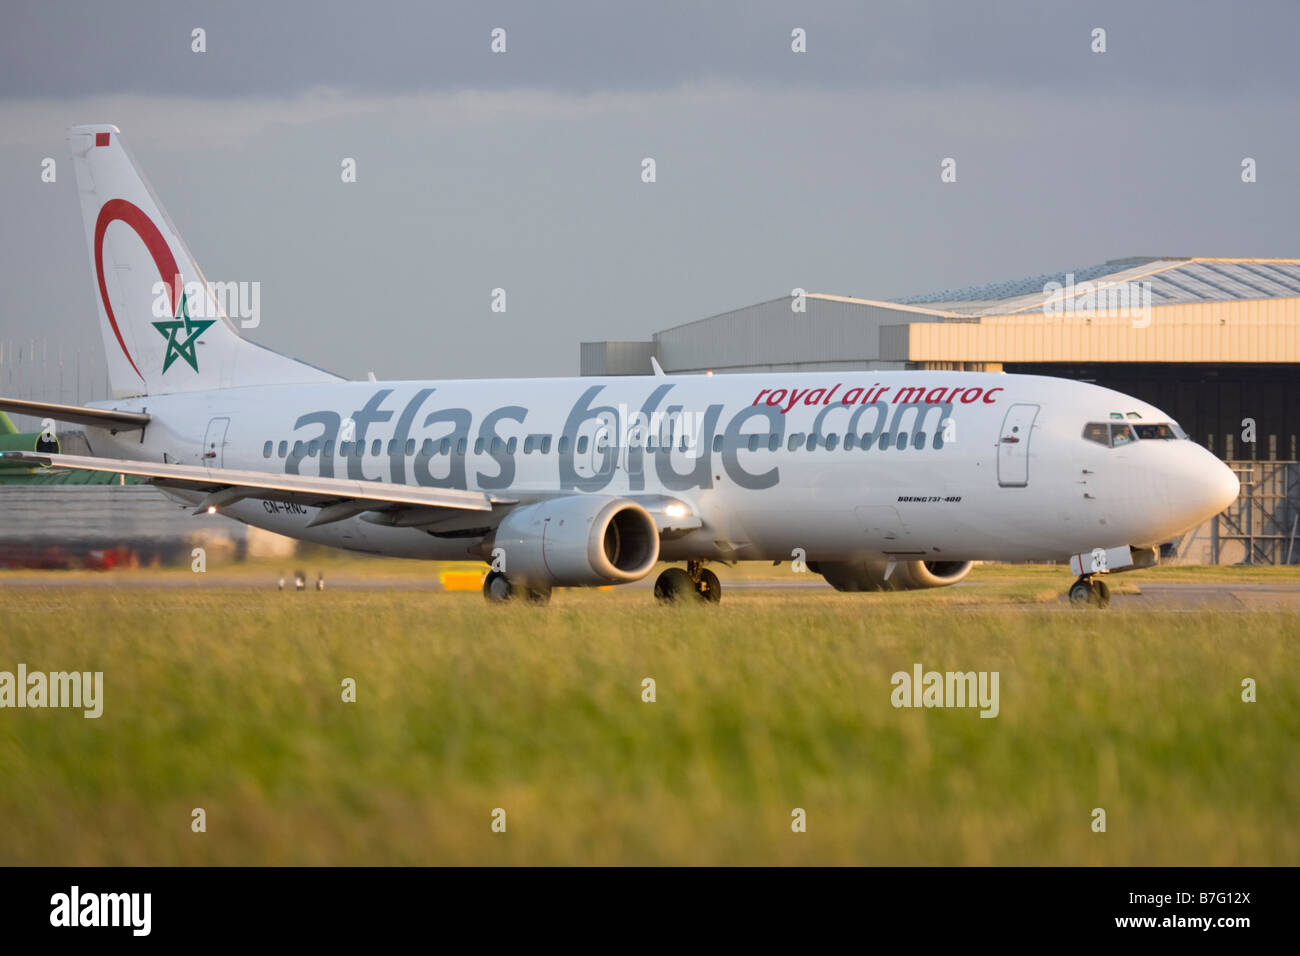 Atlas Blue (Royal Air Maroc - RAM) Boeing 737-4B6 at London Heathrow airport. - Stock Image